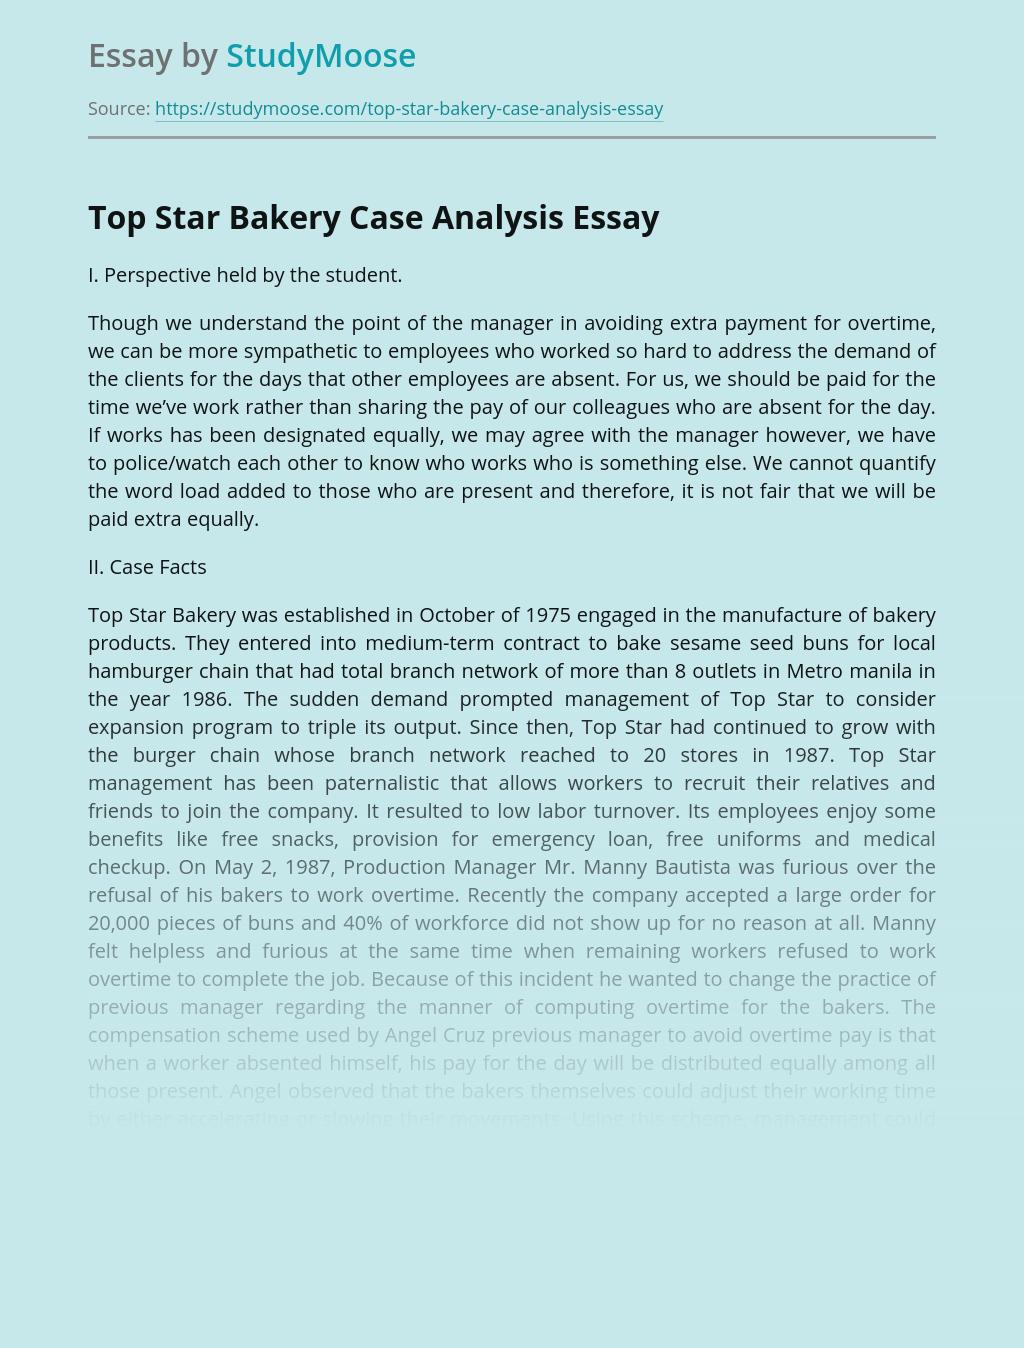 Top Star Bakery Case Analysis